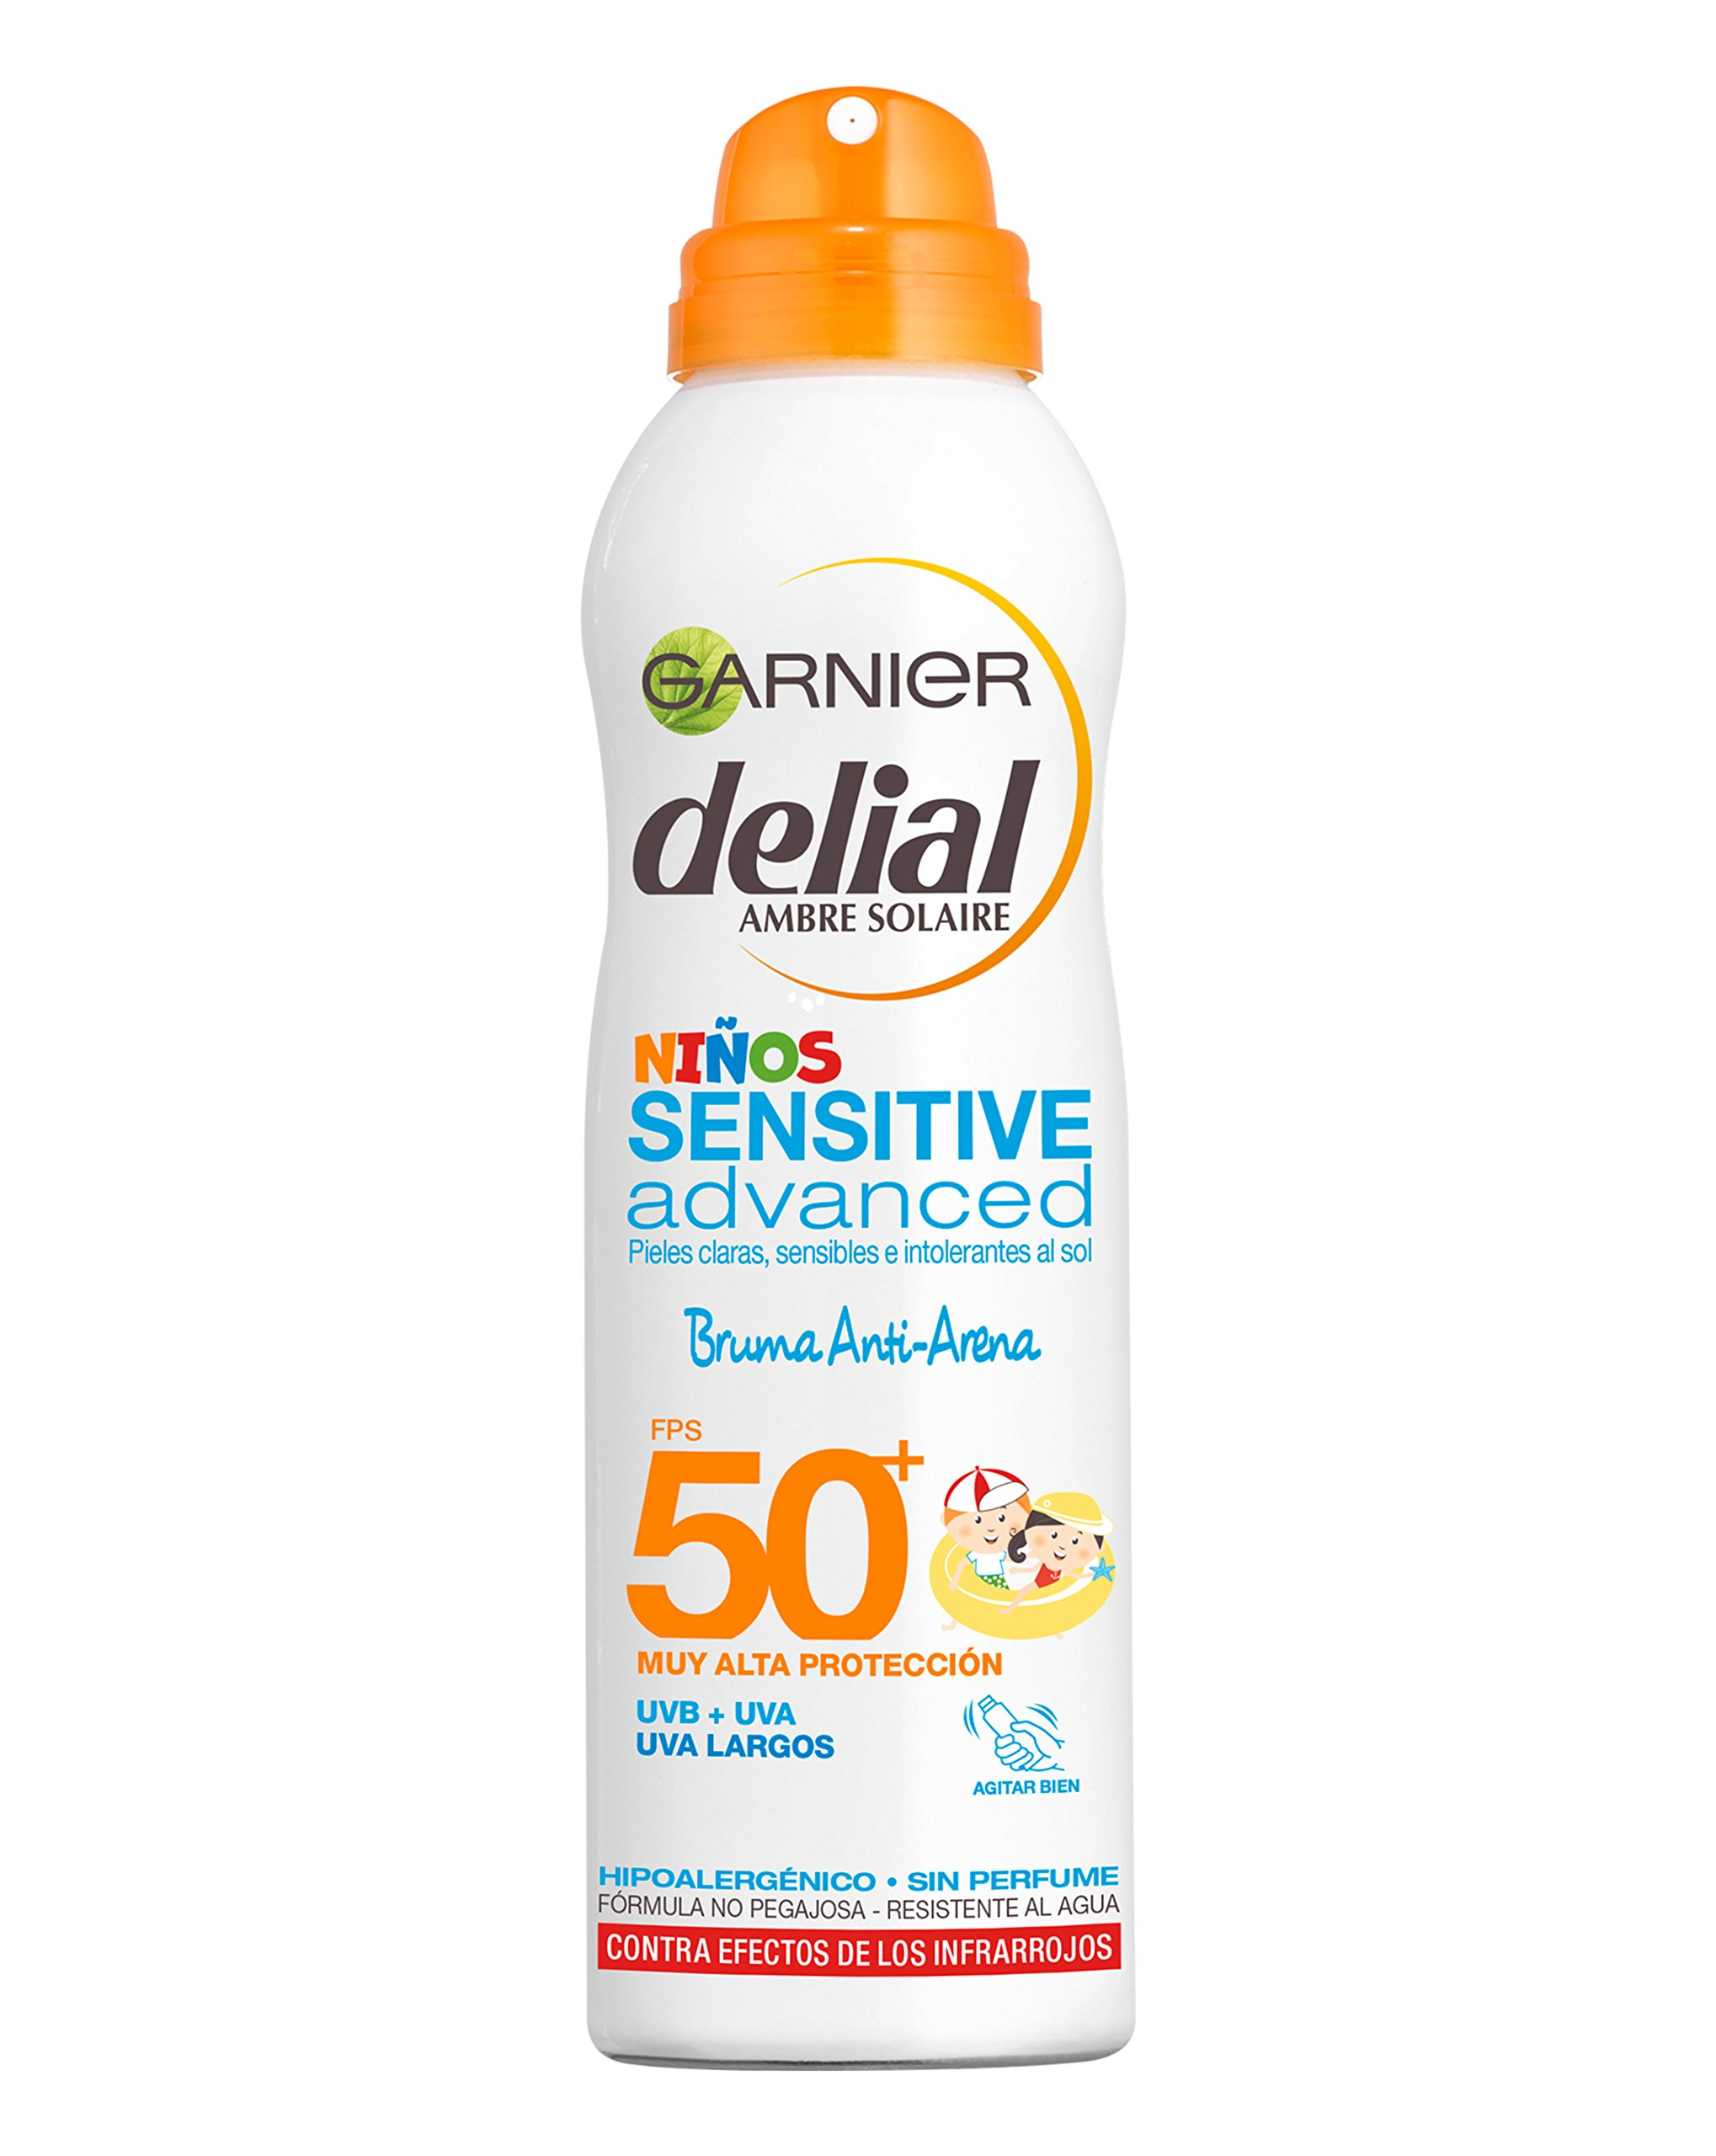 Garnier Delial Niños Sensitive Advanced Spray Protector Solar Antiarena para Pieles Claras, Sensibles e Intolerantes